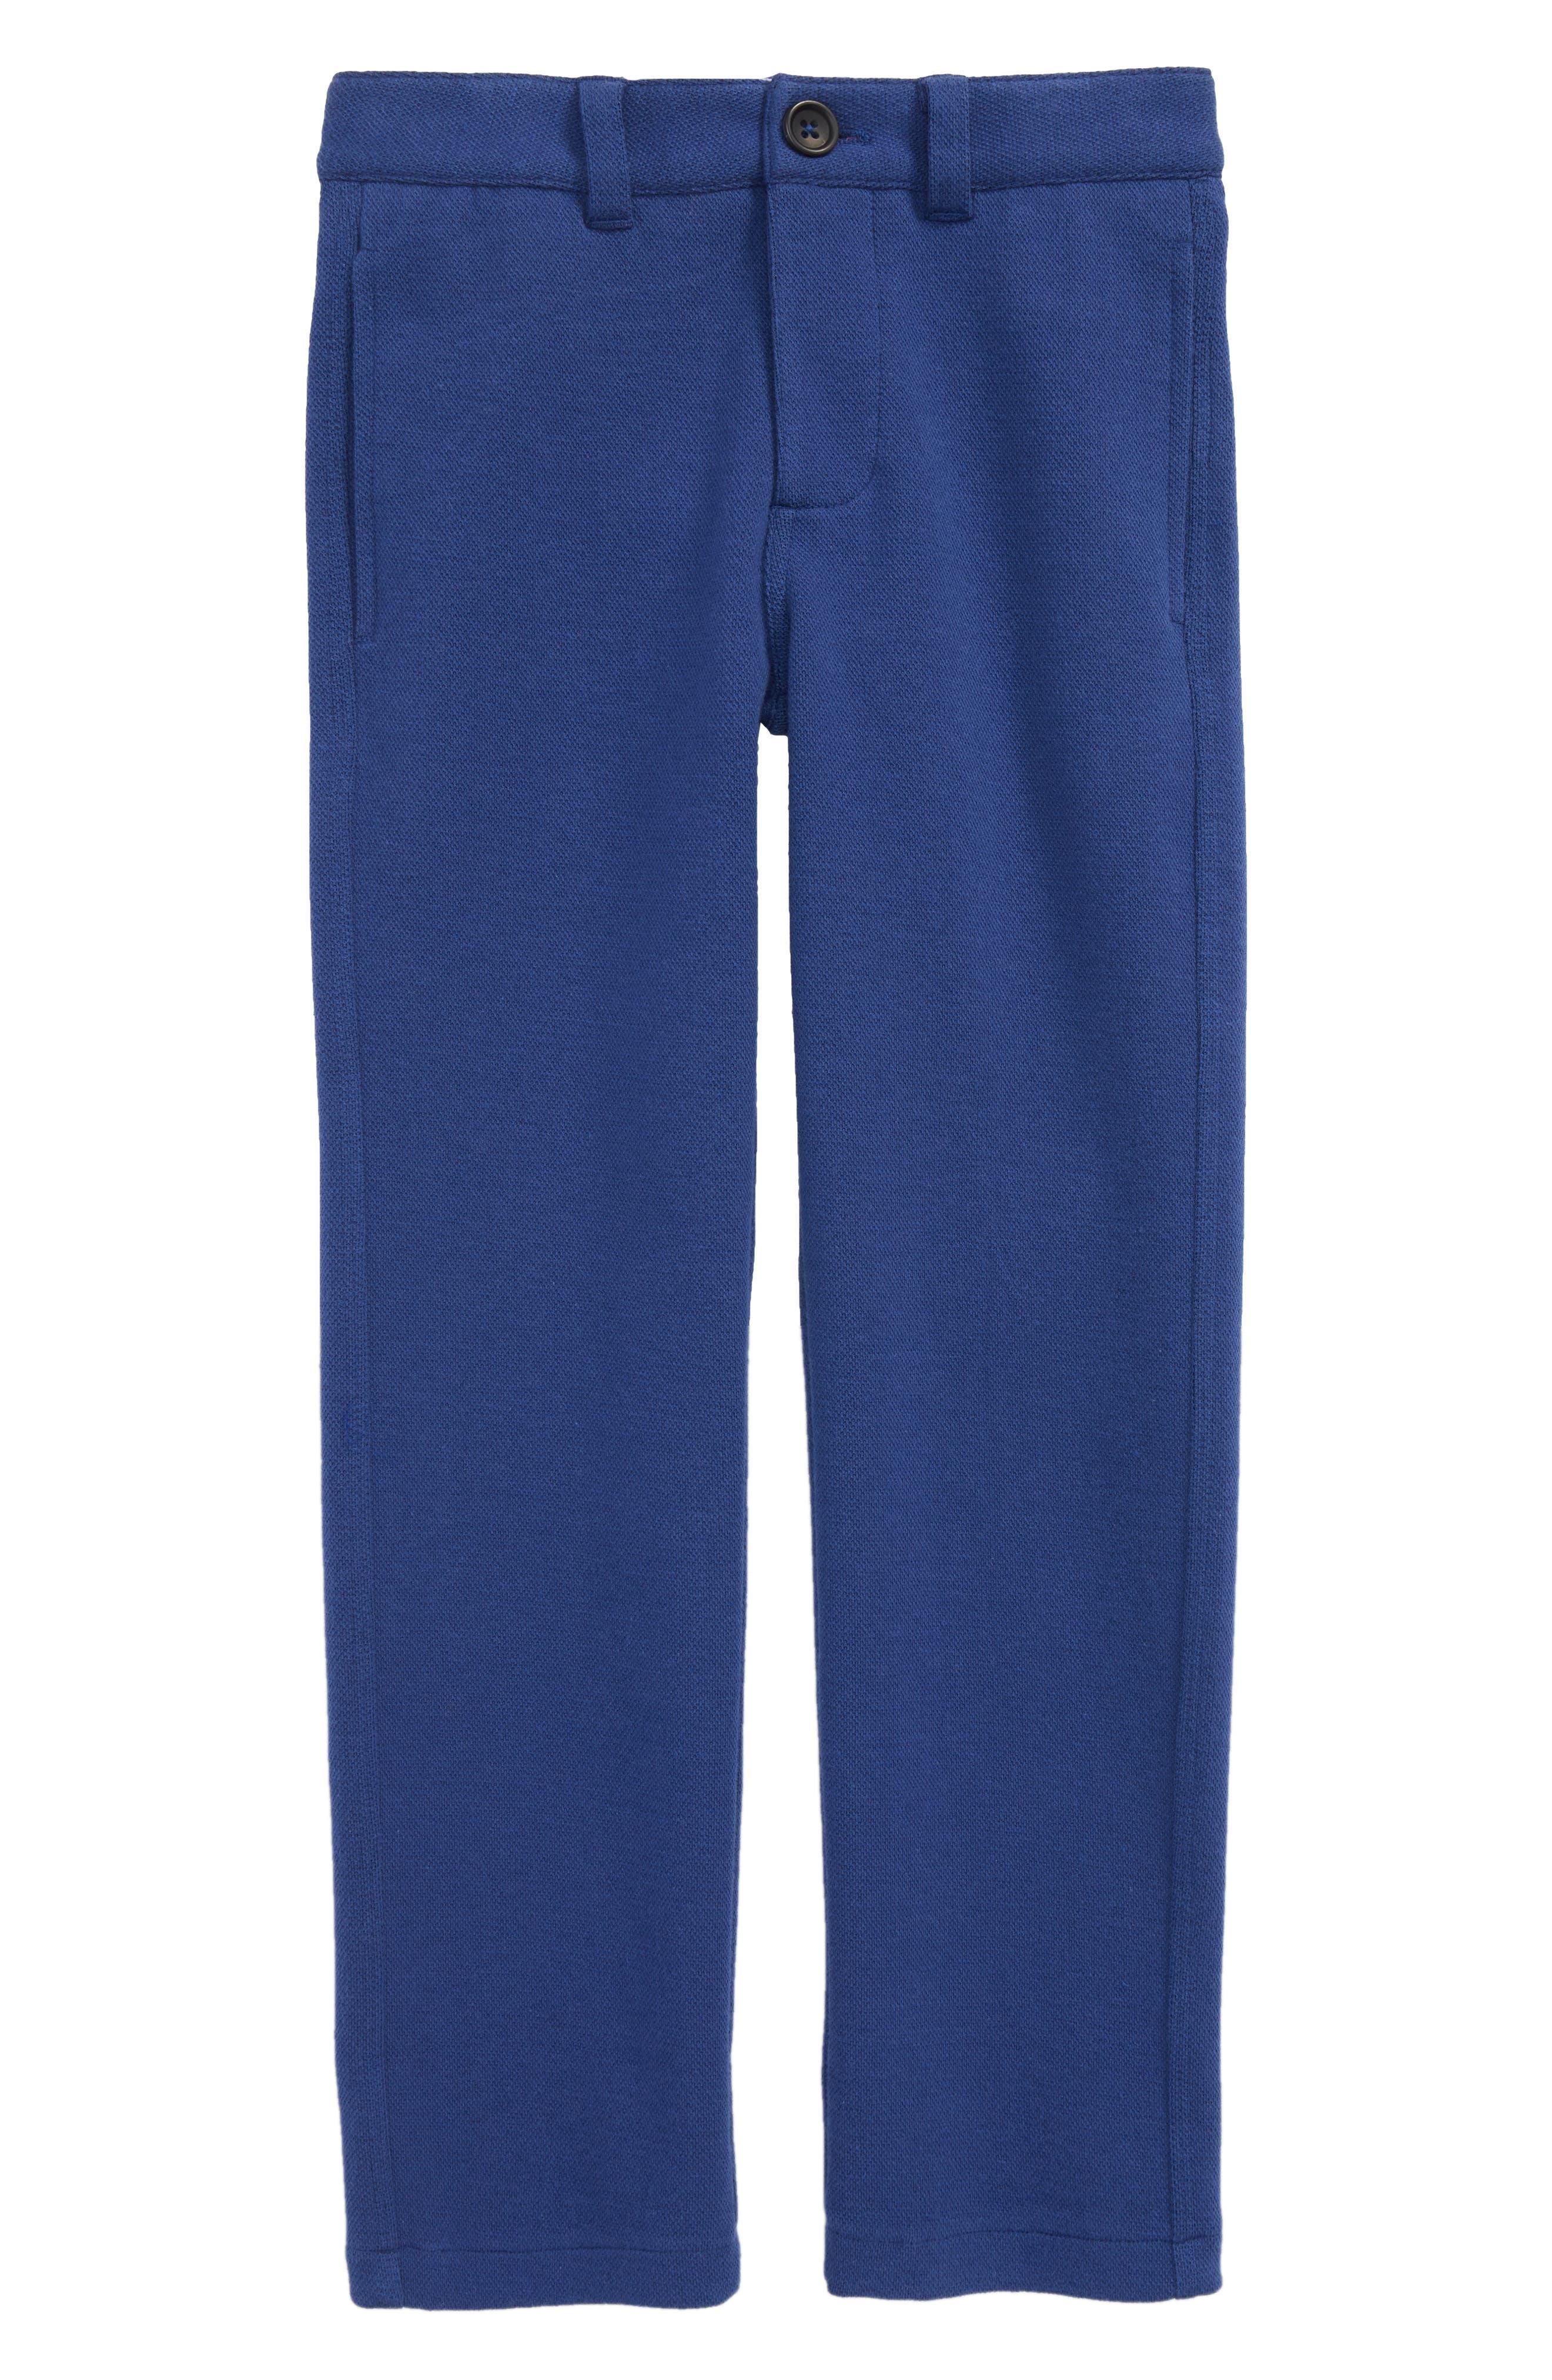 Alternate Image 1 Selected - Mini Boden Jersey Chino Pants (Toddler Boys, Little Boys & Big Boys)